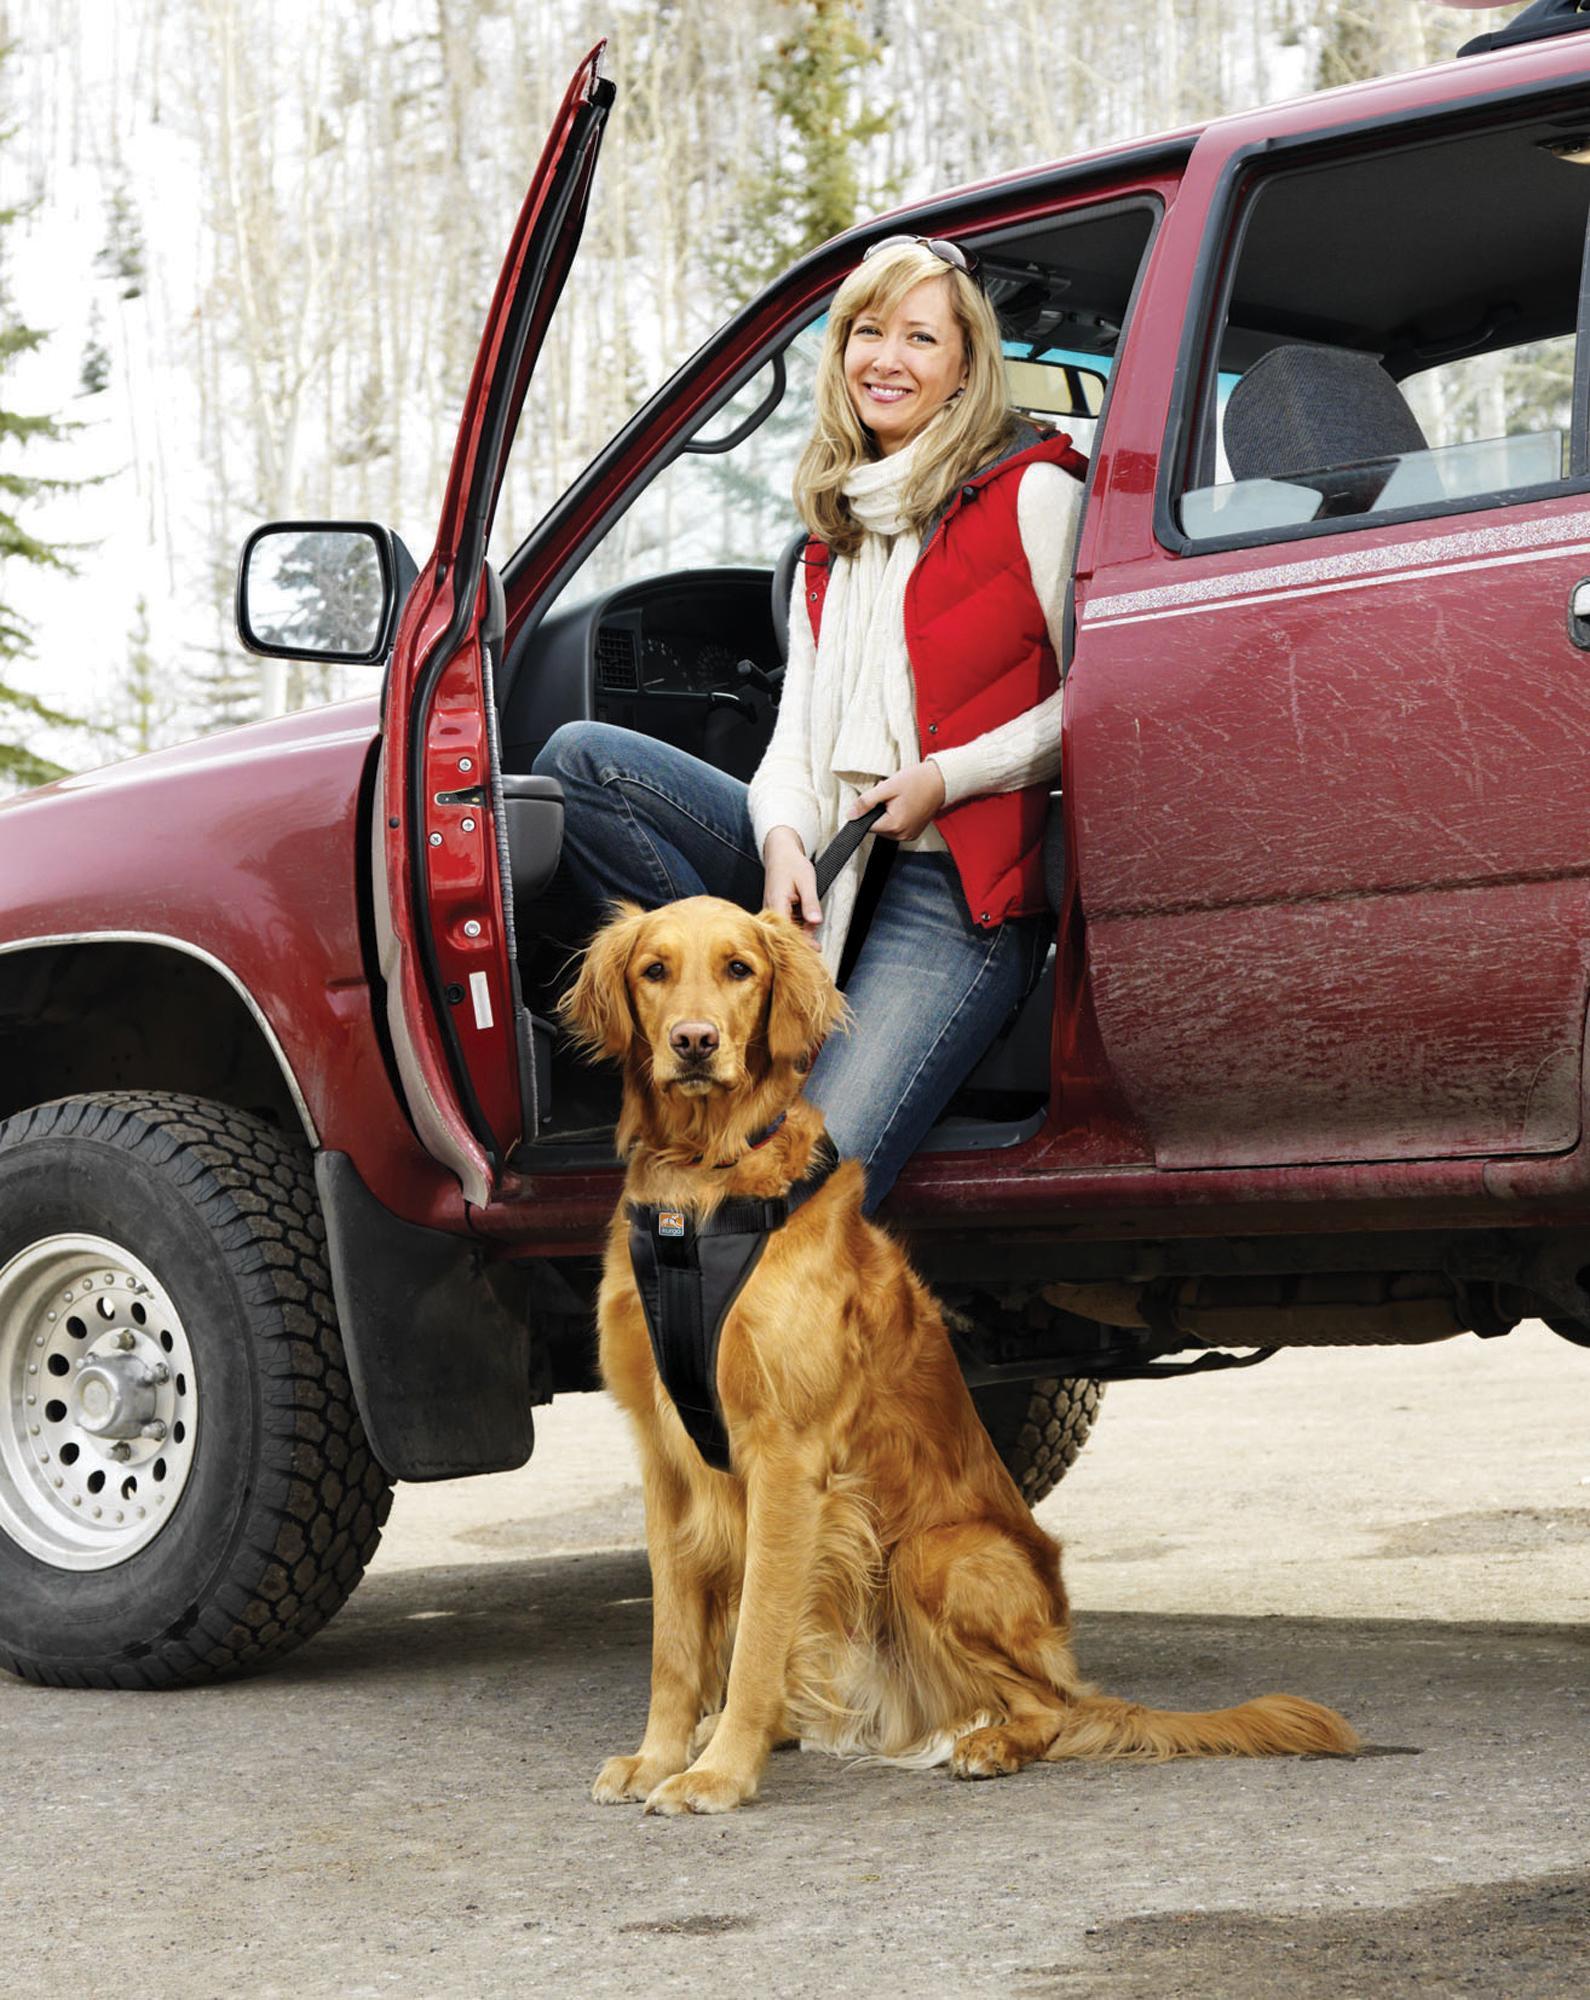 Kurgo Vehicle Safety Harness For Dogs Universal Seatbelt